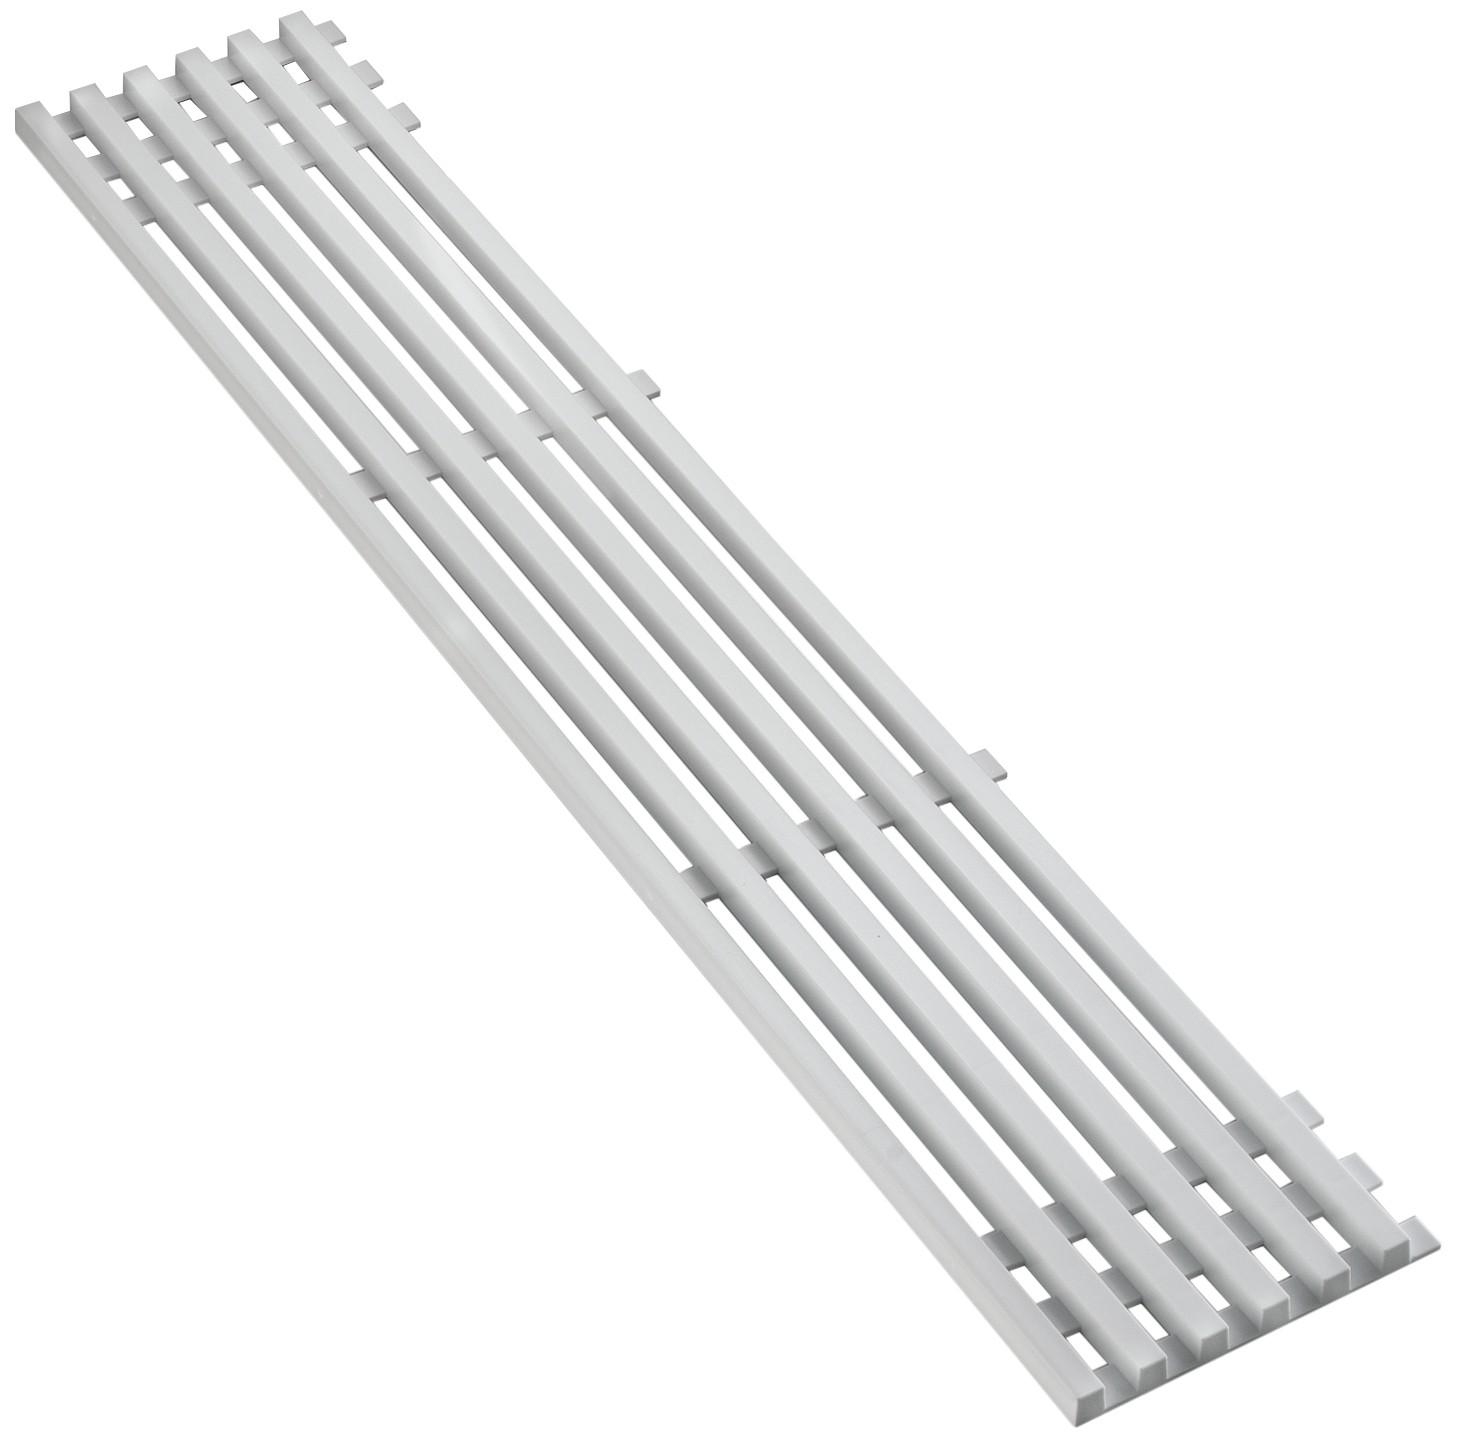 352193 : Nordic Quality ventilasjonsrist (hvit)